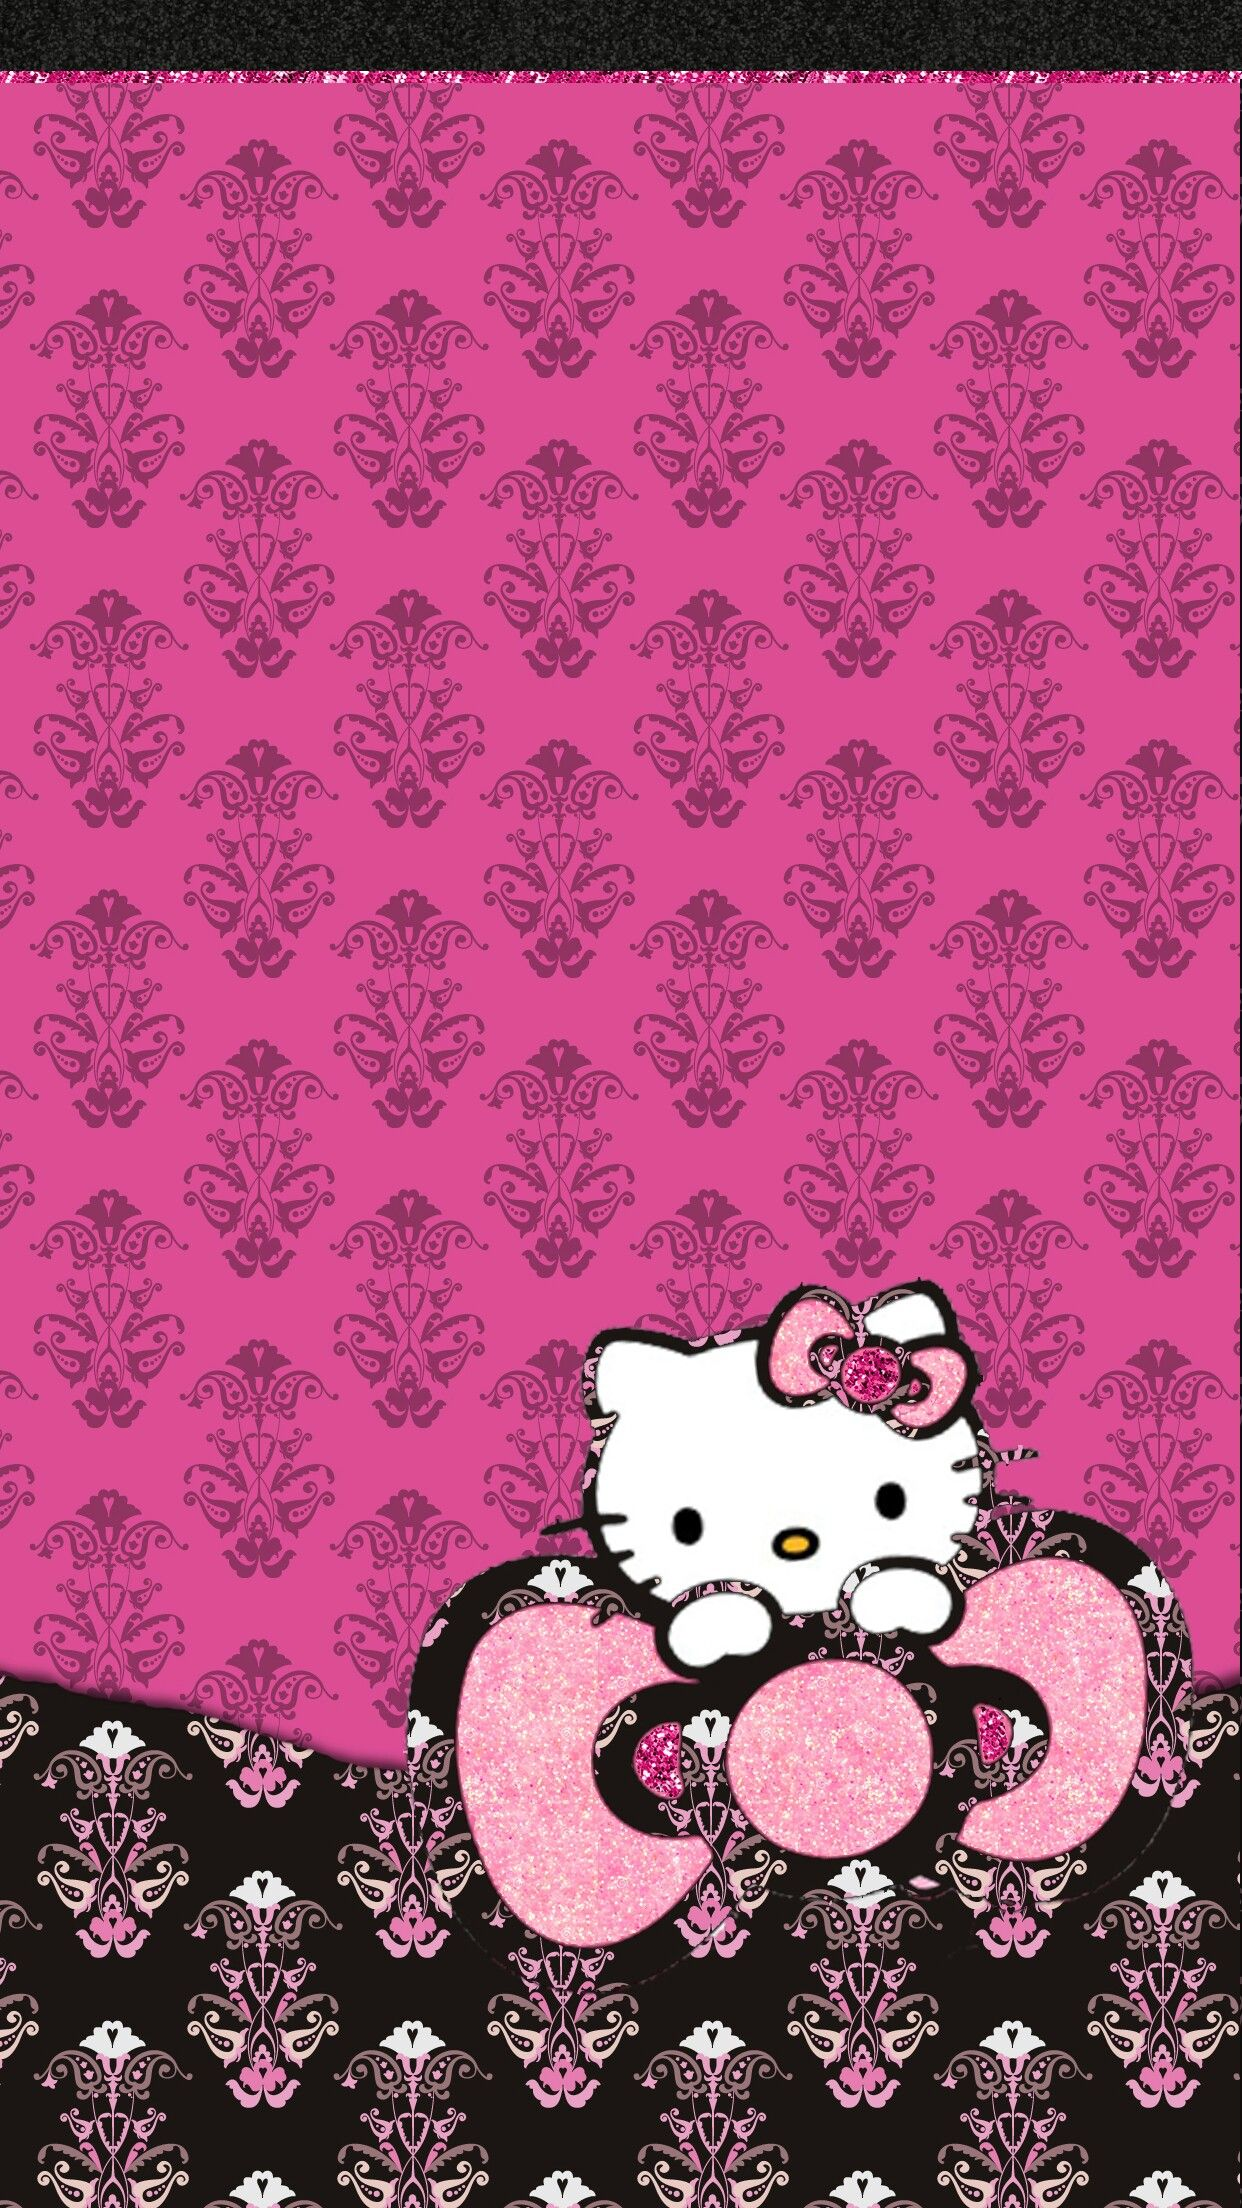 Kawaii Wallpaper Hello Kitty Mobile Stuff Sanrio Jade Skull Backgrounds Walpaper